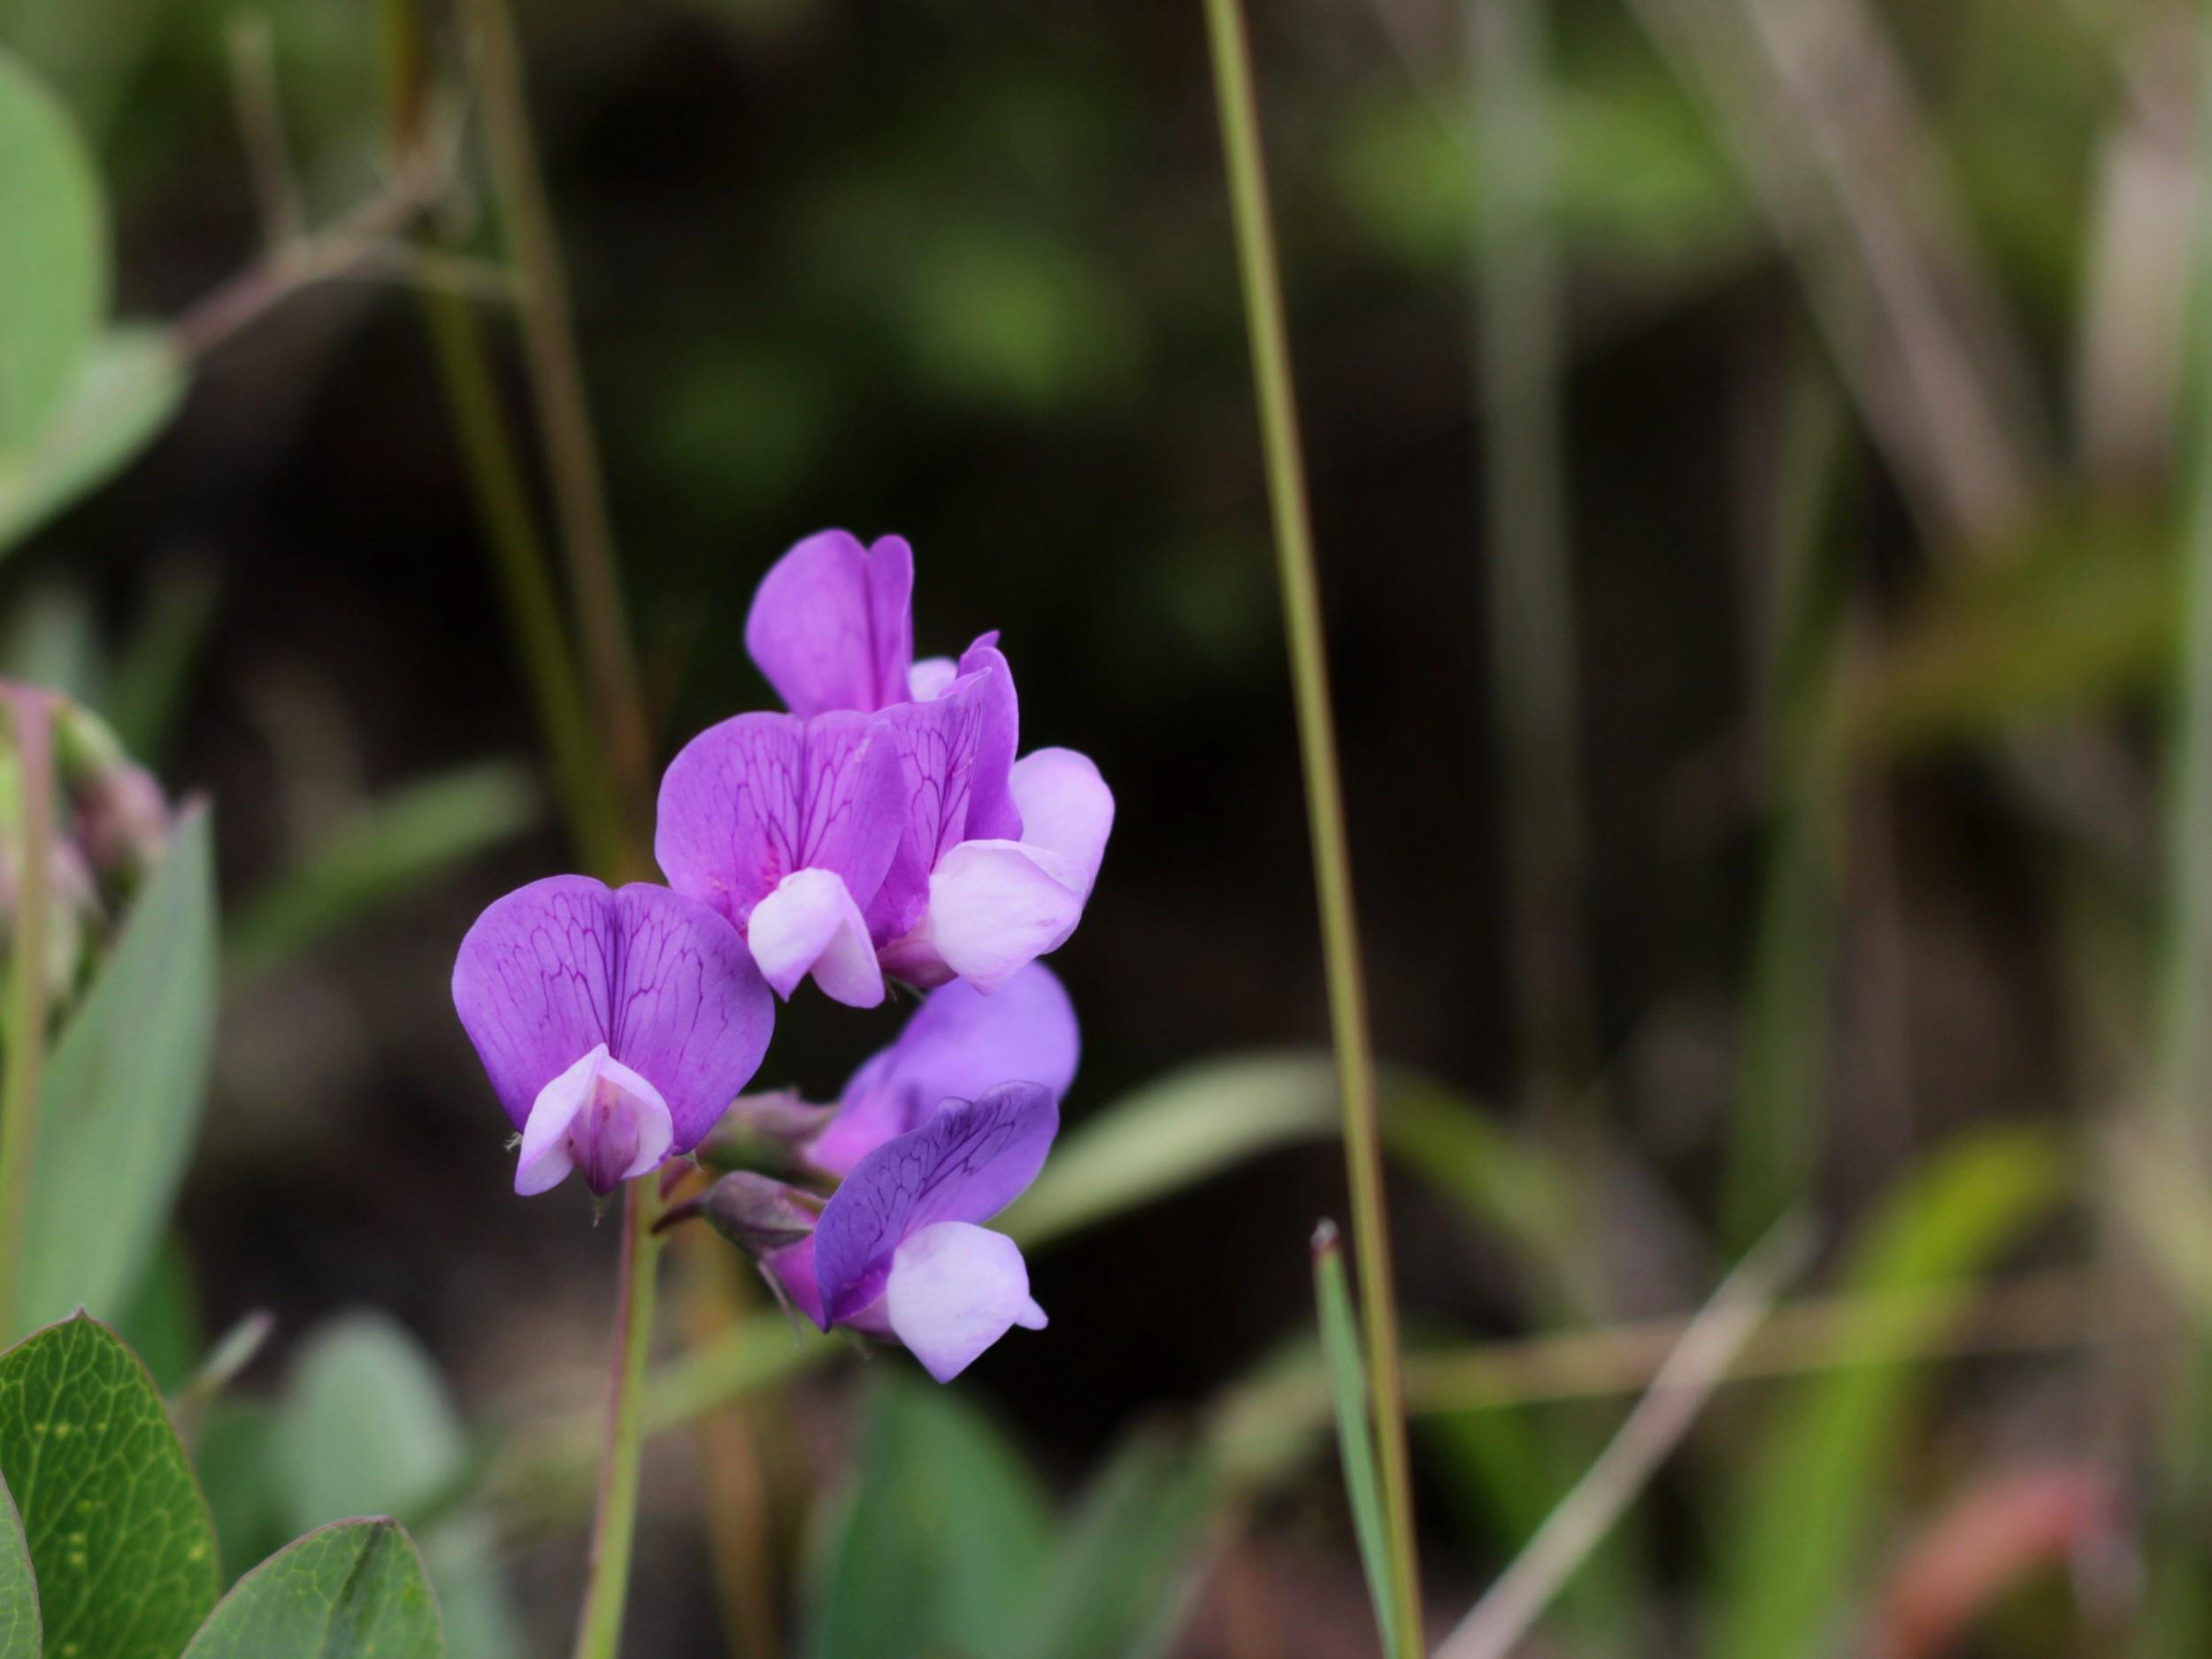 Flower - Isle Royale, MI - July 2014